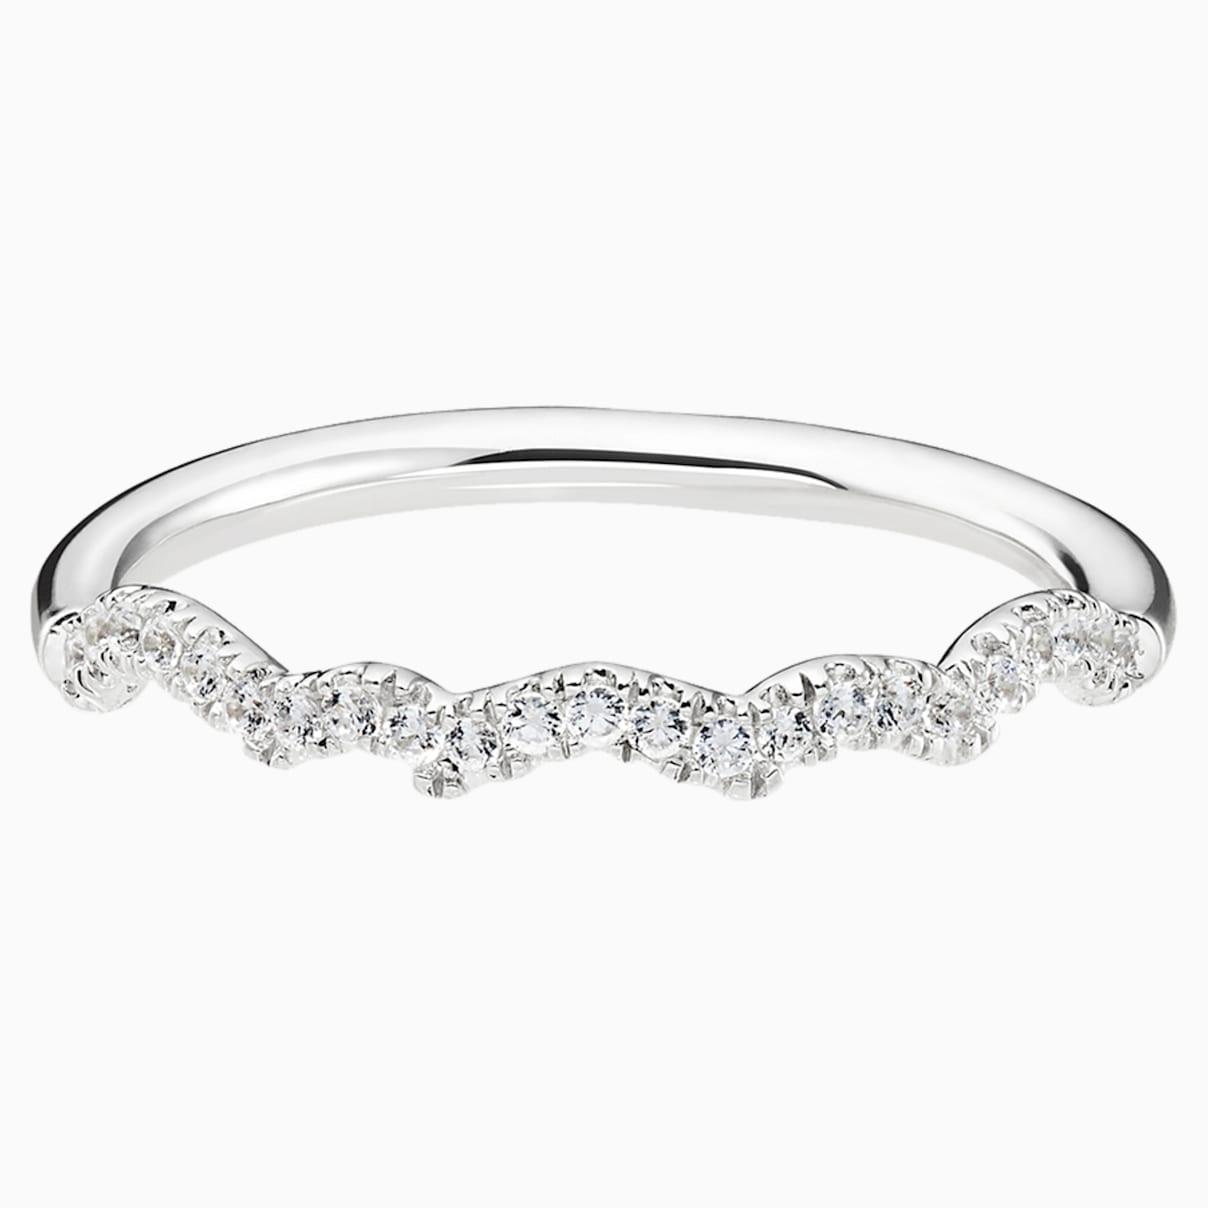 Knot of True Love Slim Band Ring, Swarovski Created Diamonds, 18K White Gold, Size 55